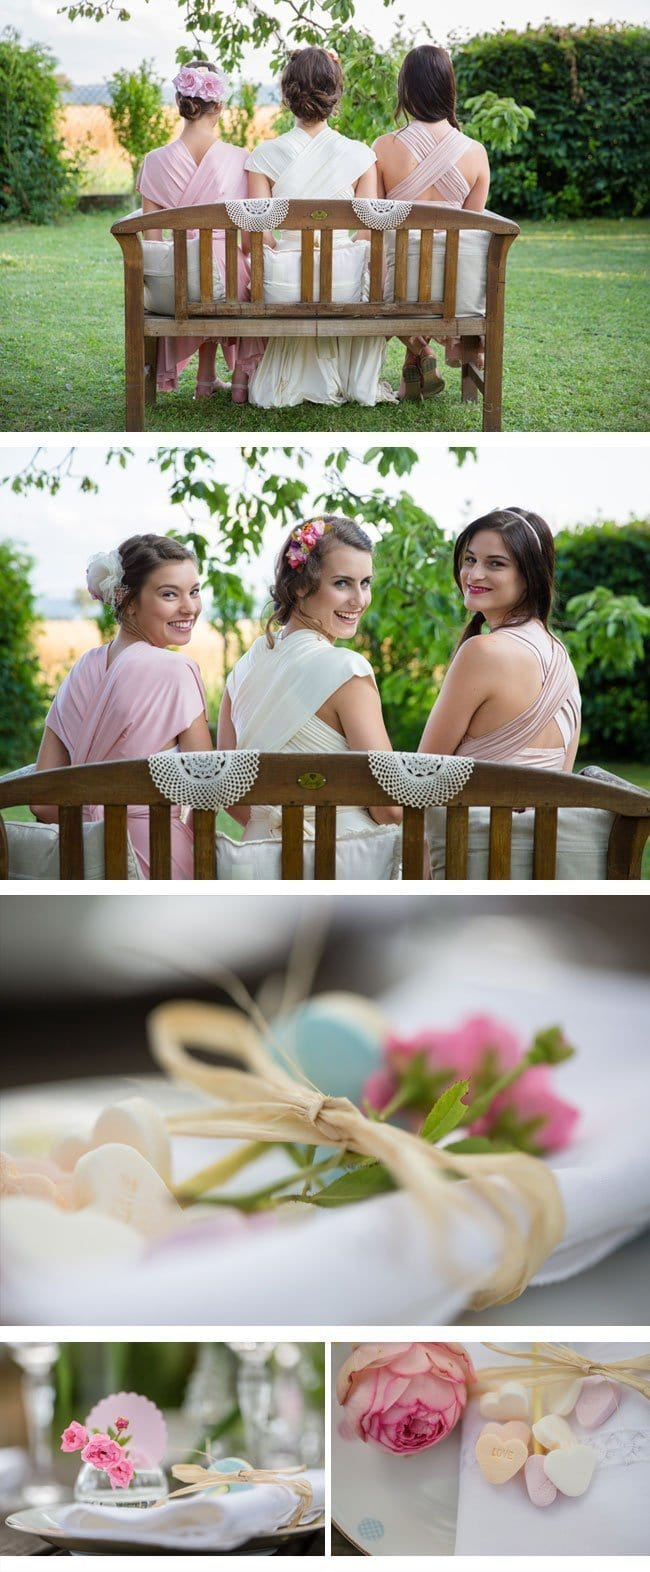 romantikfeeling11-bridal shower